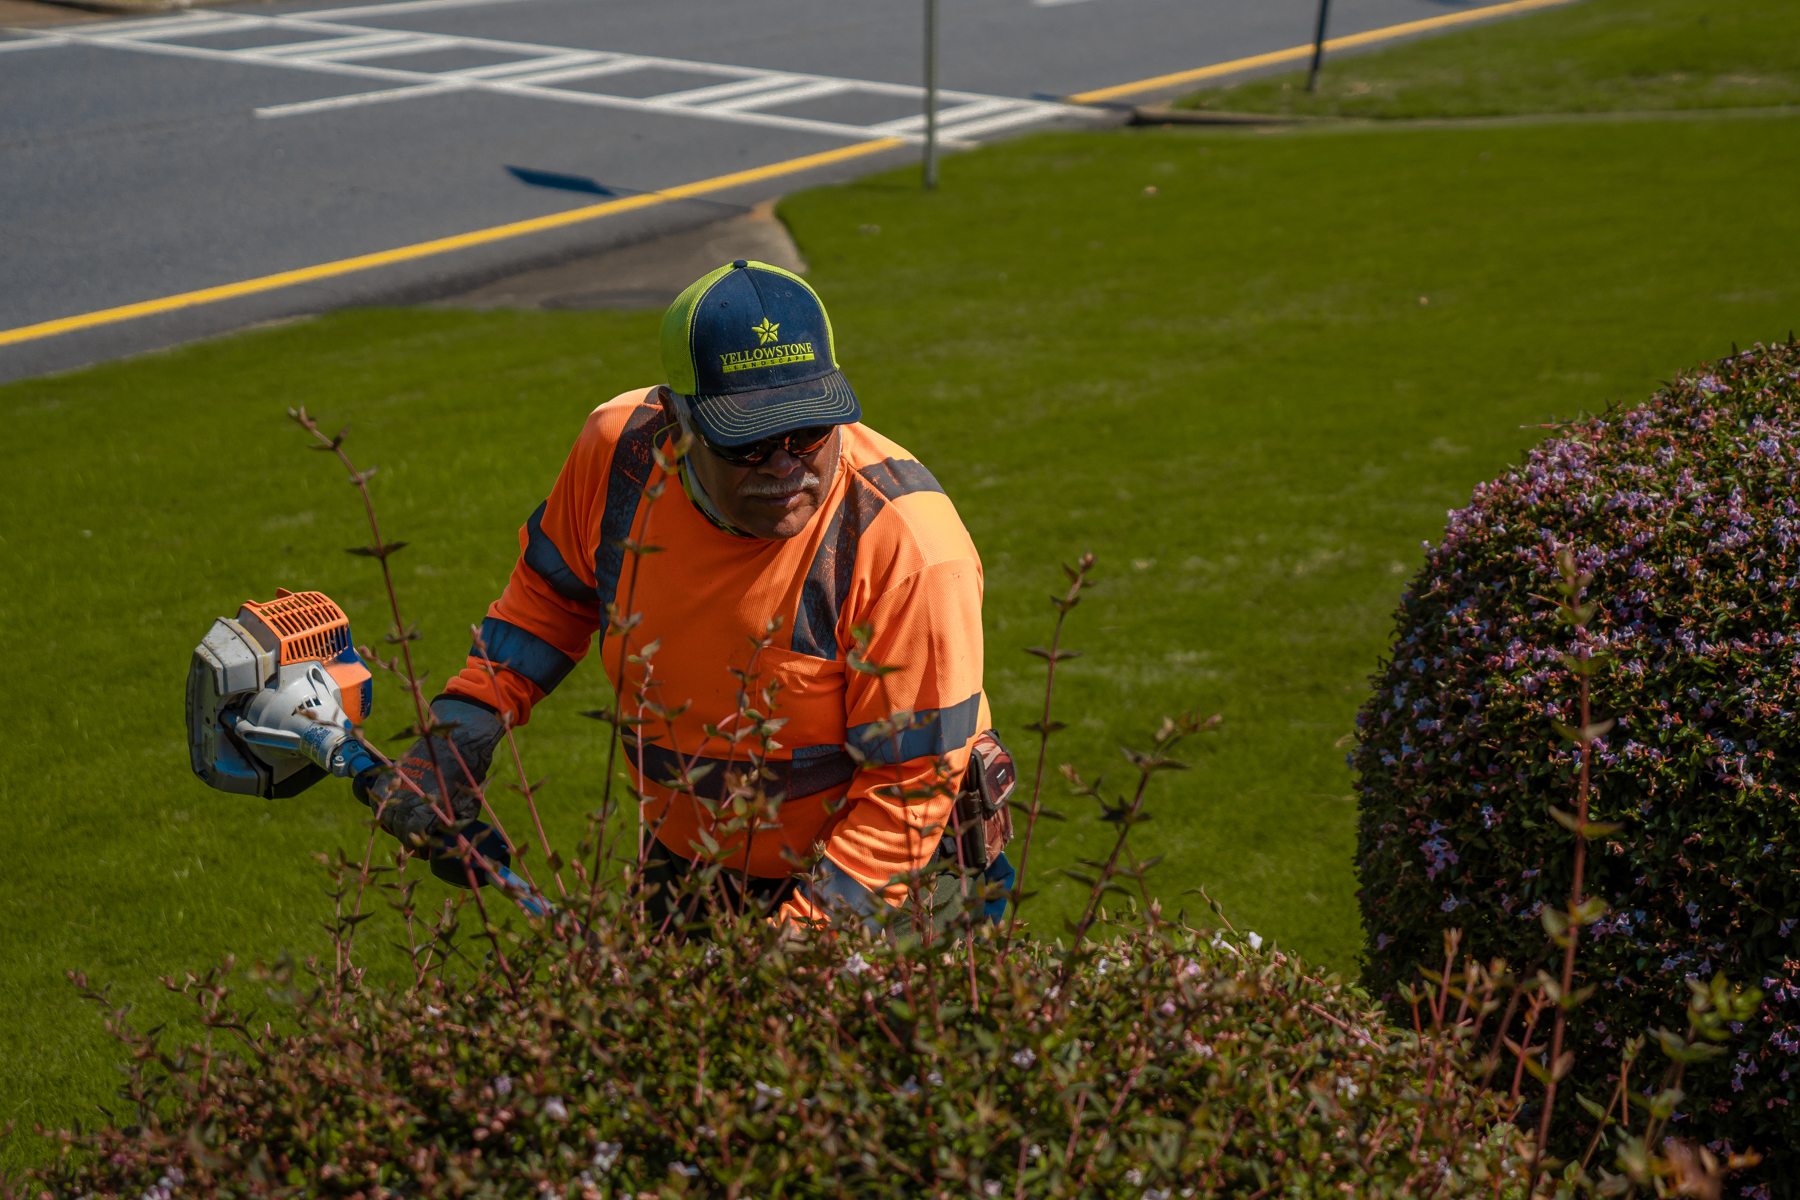 Lawn care technician pruning shrubs